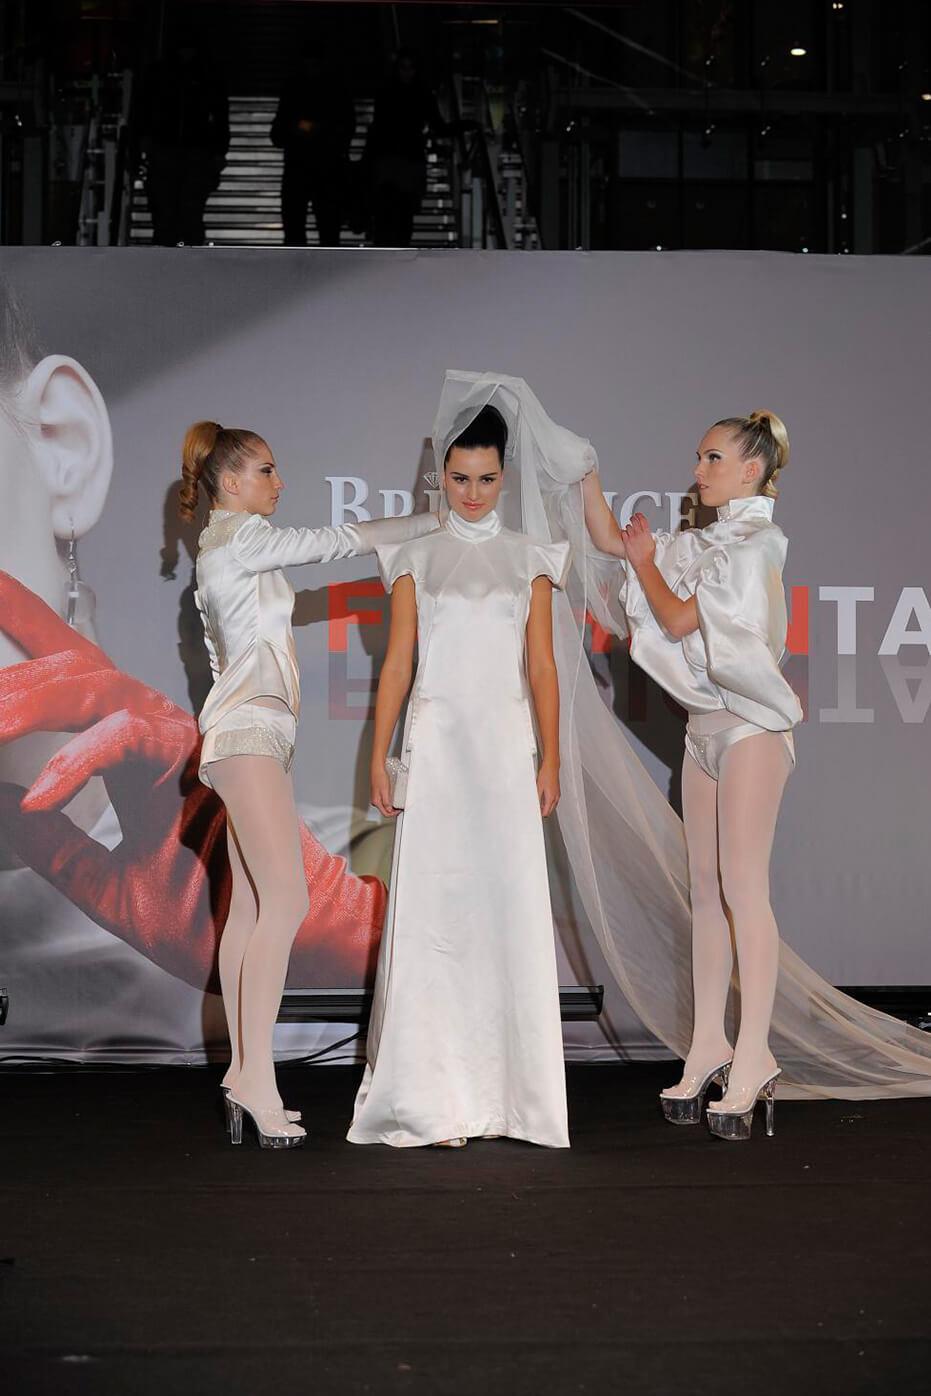 Brillance Fashion Talent